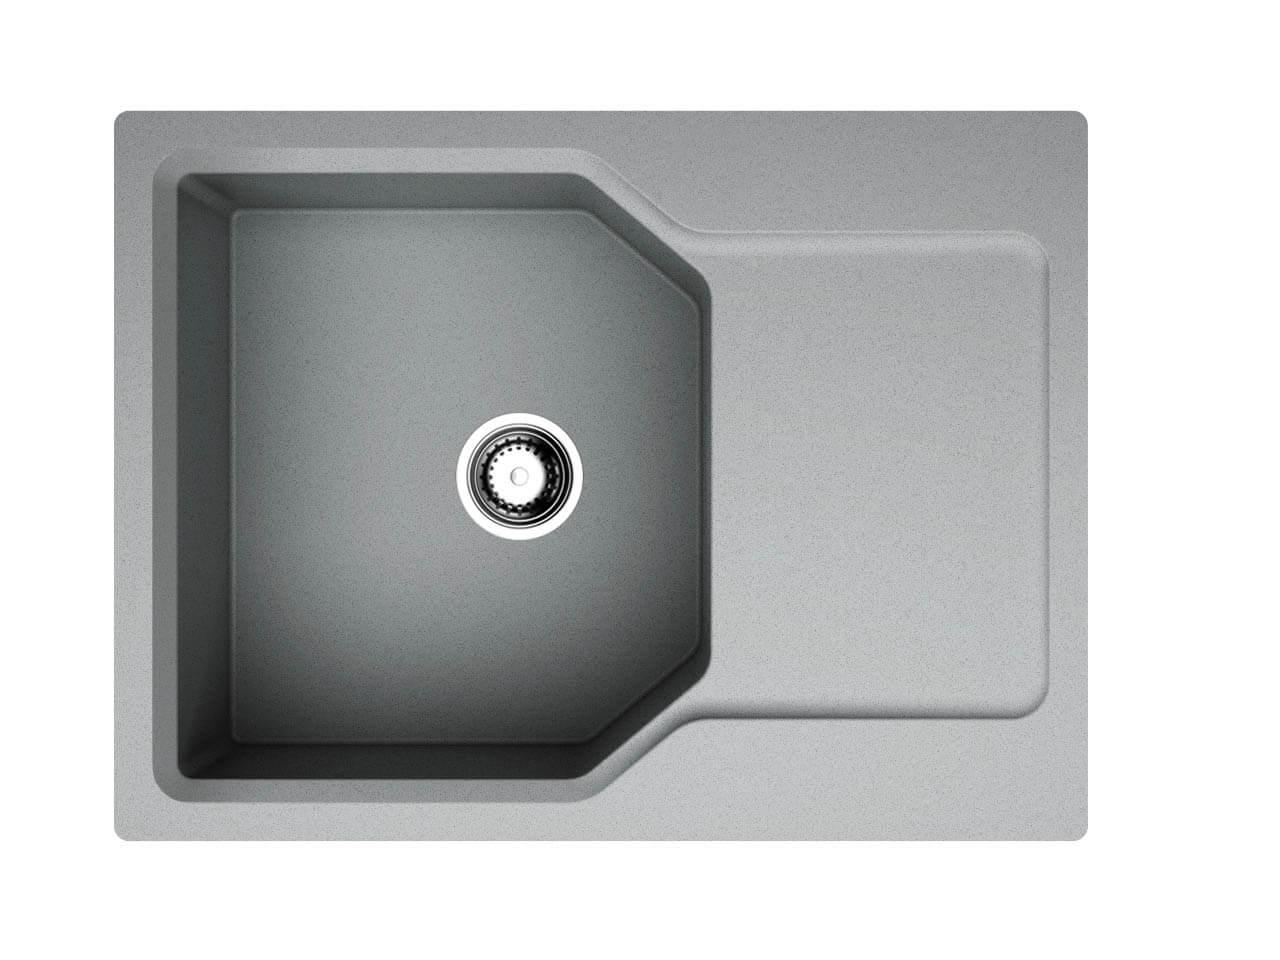 Кухонная мойка Omoikiri Yonaka 65-GR leningrad grey